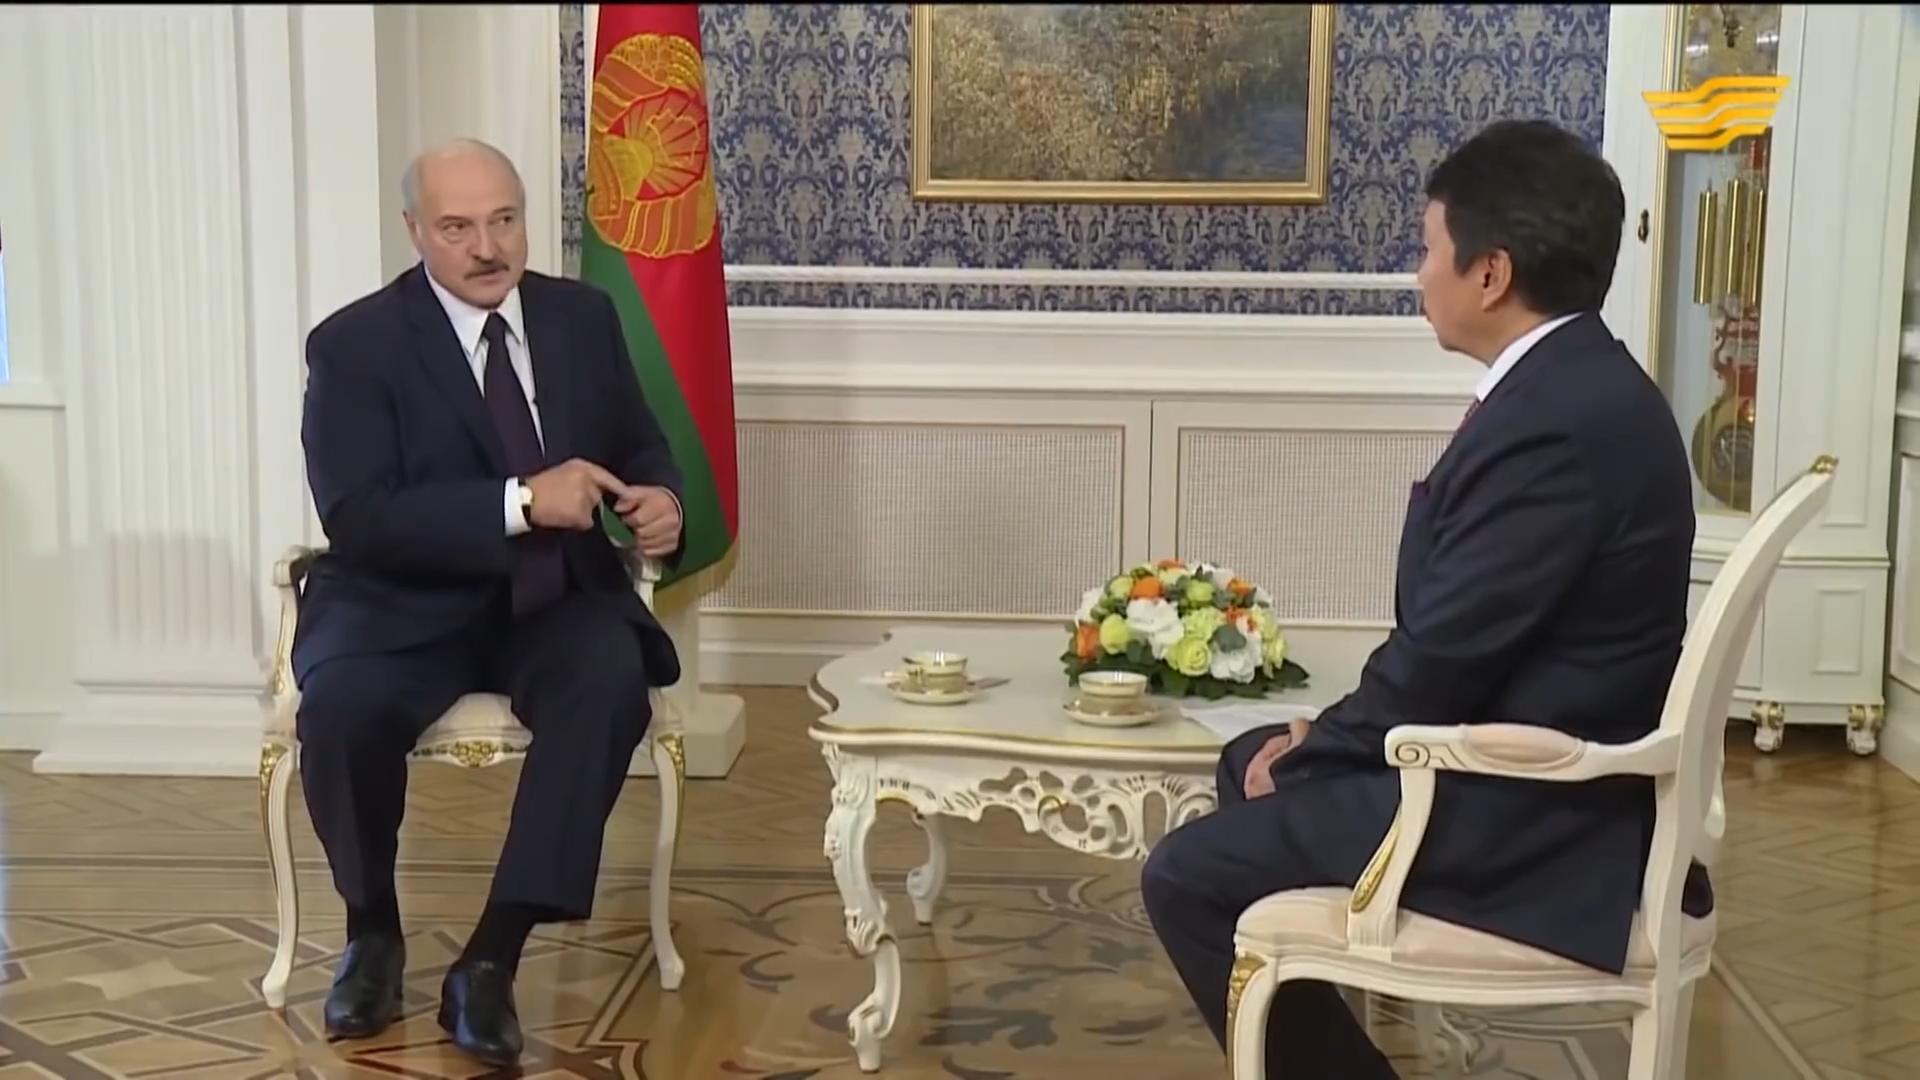 20191022_20-40-Александр Лукашенко дал эксклюзивное интервью телеканалу «Хабар»-scr34